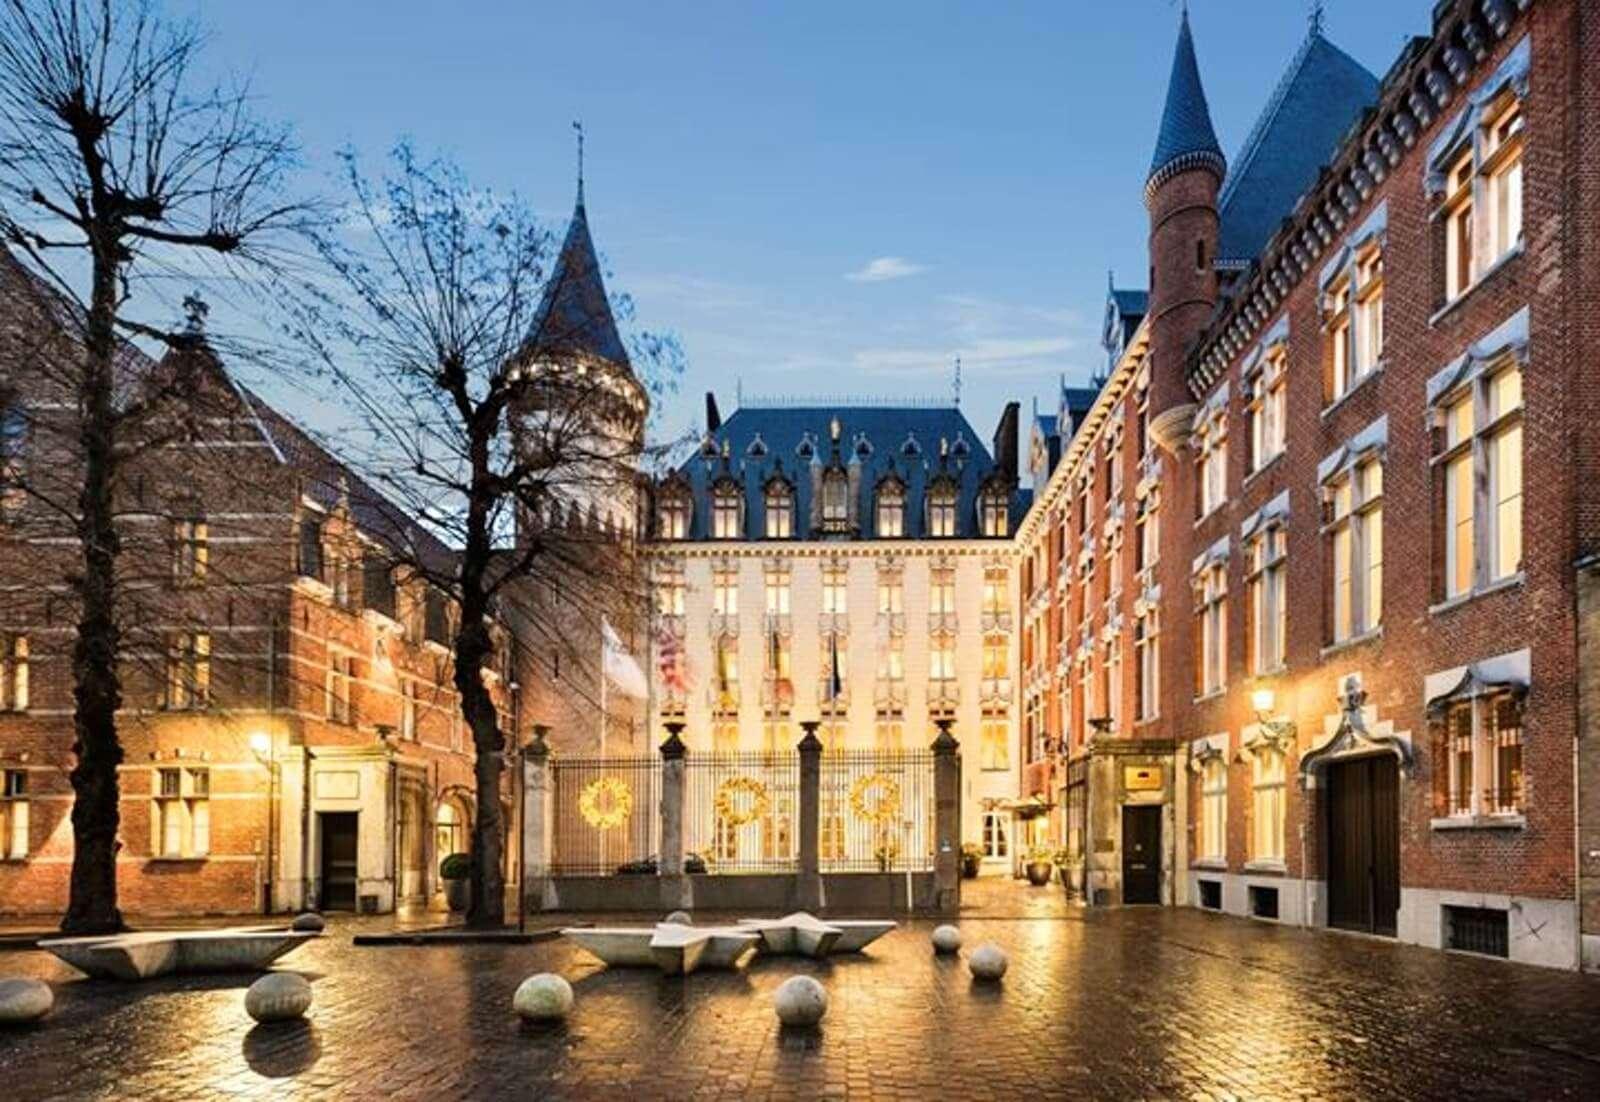 Hotel Dukes' Palace in Belgium